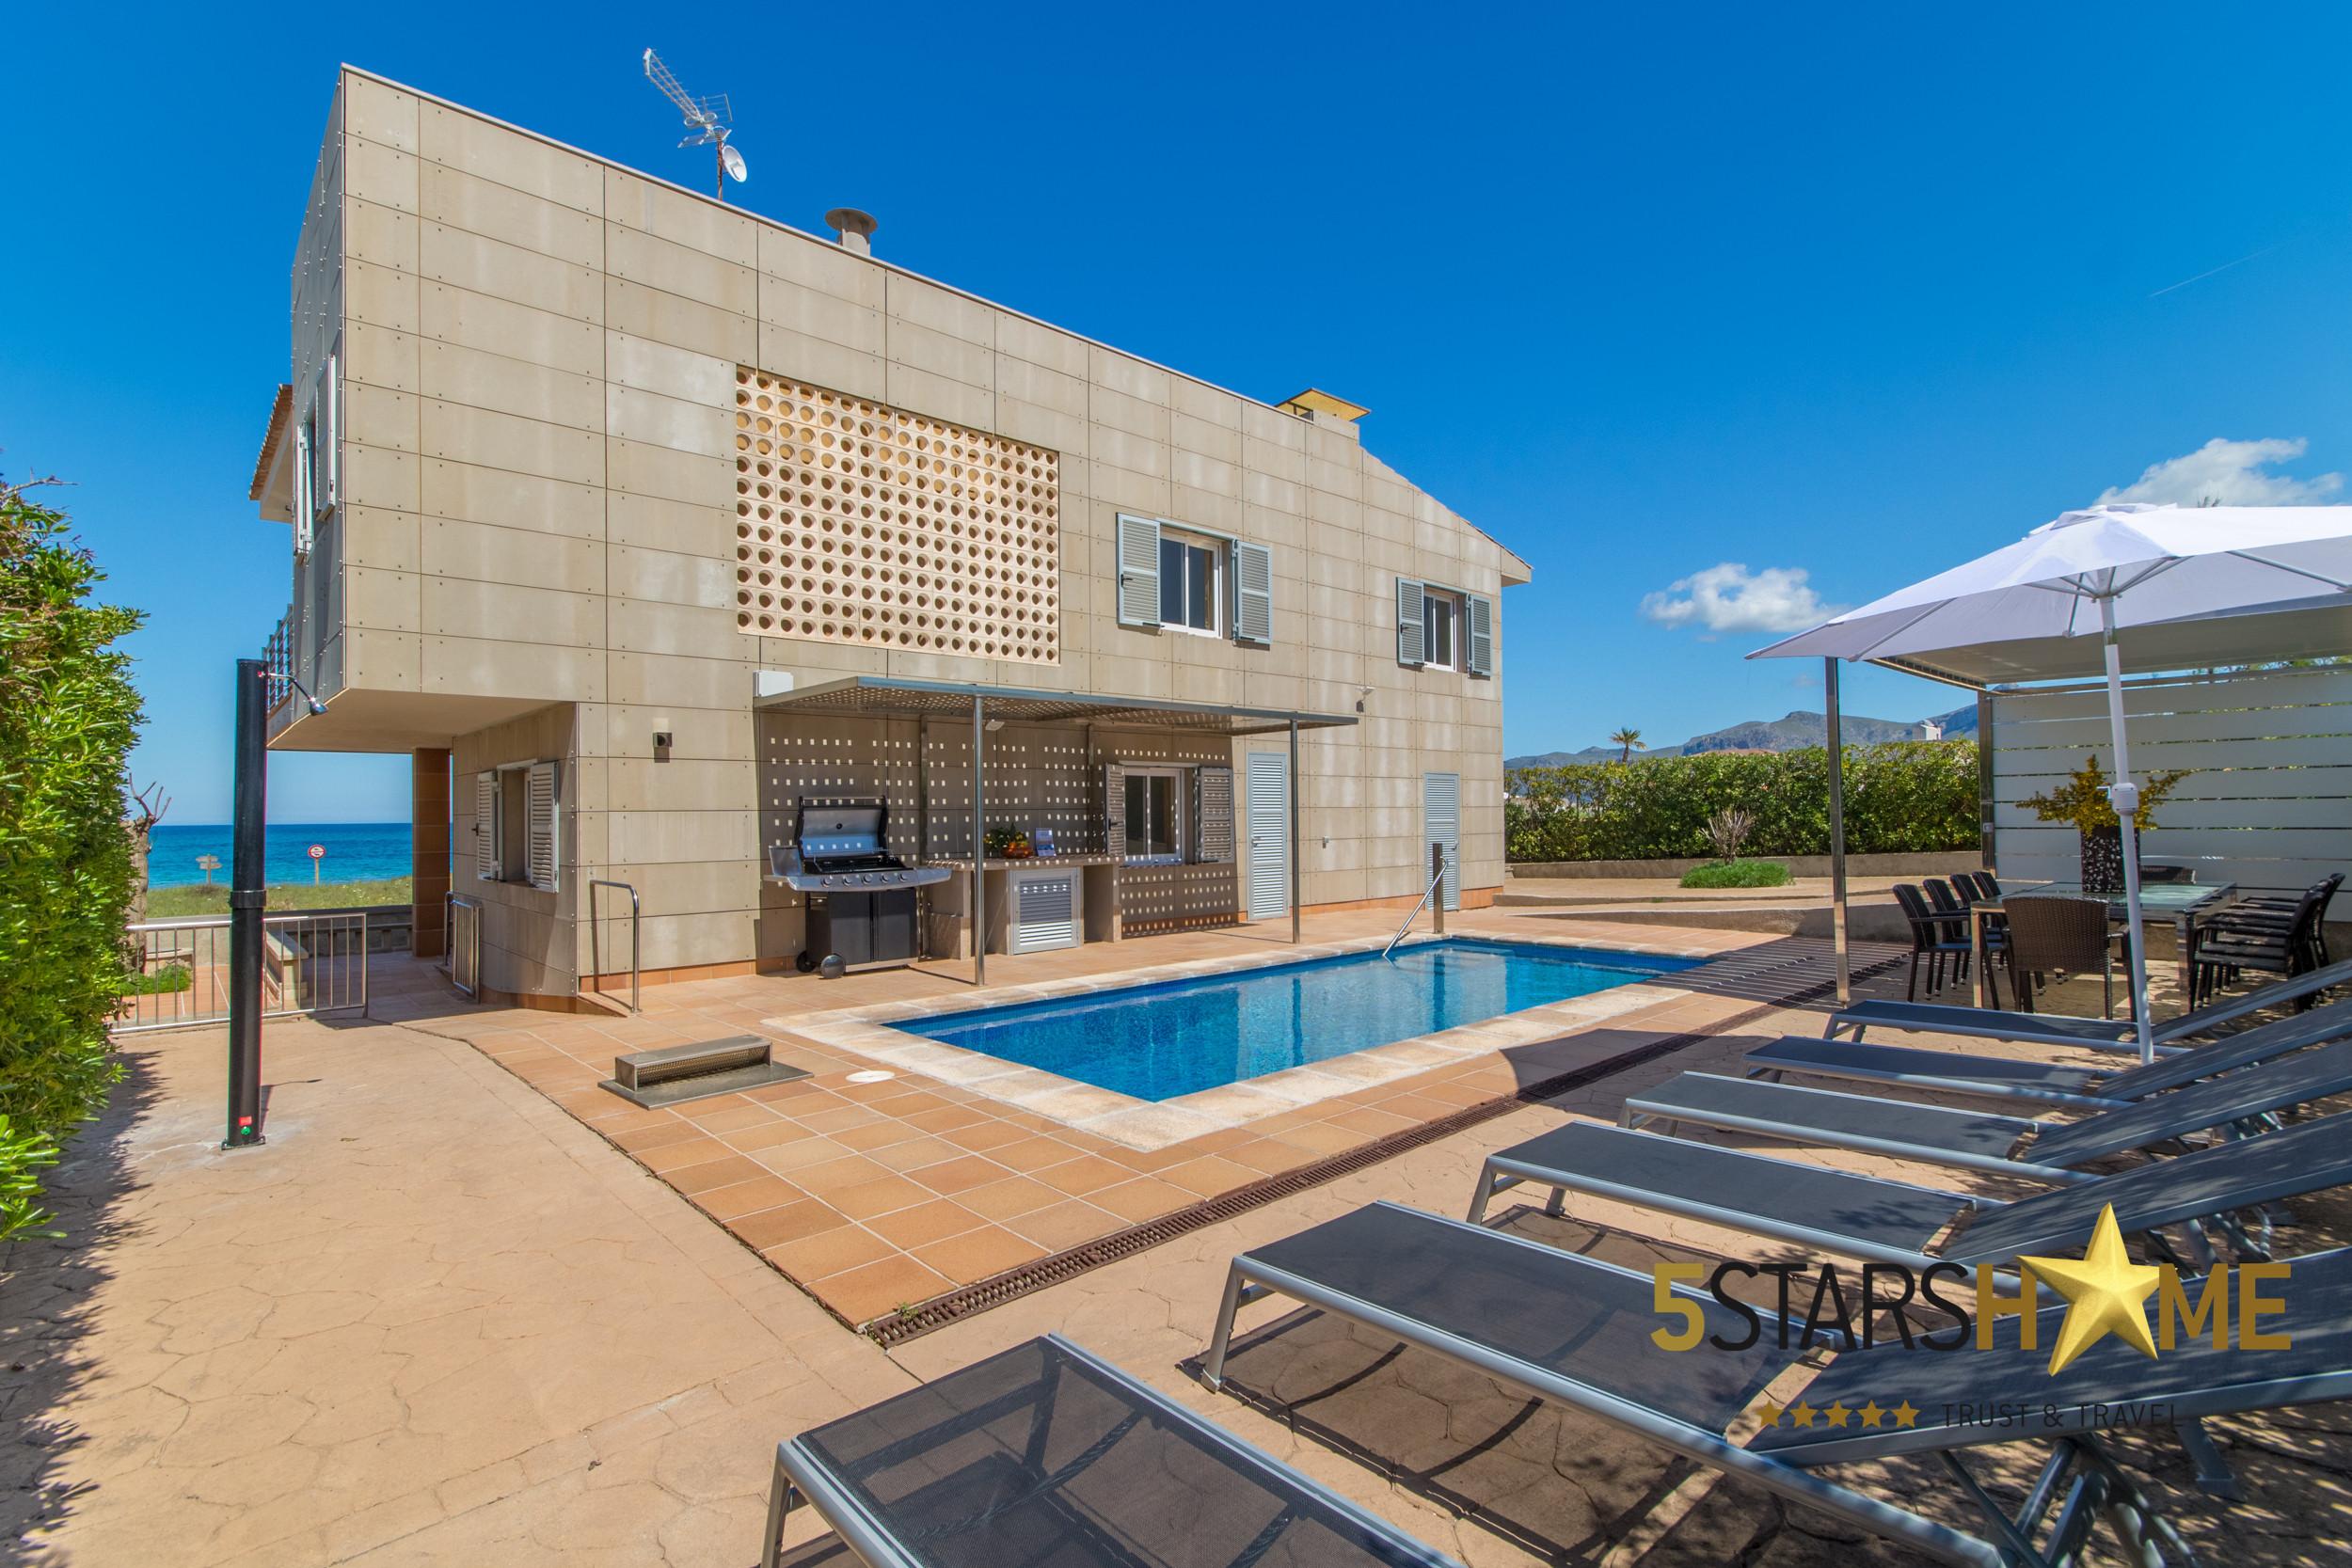 5 habitaciones dobles, 3 baños, 1 baño completo exterior, AC, internet wifi gratuito, piscina, terraza con barbacoa.